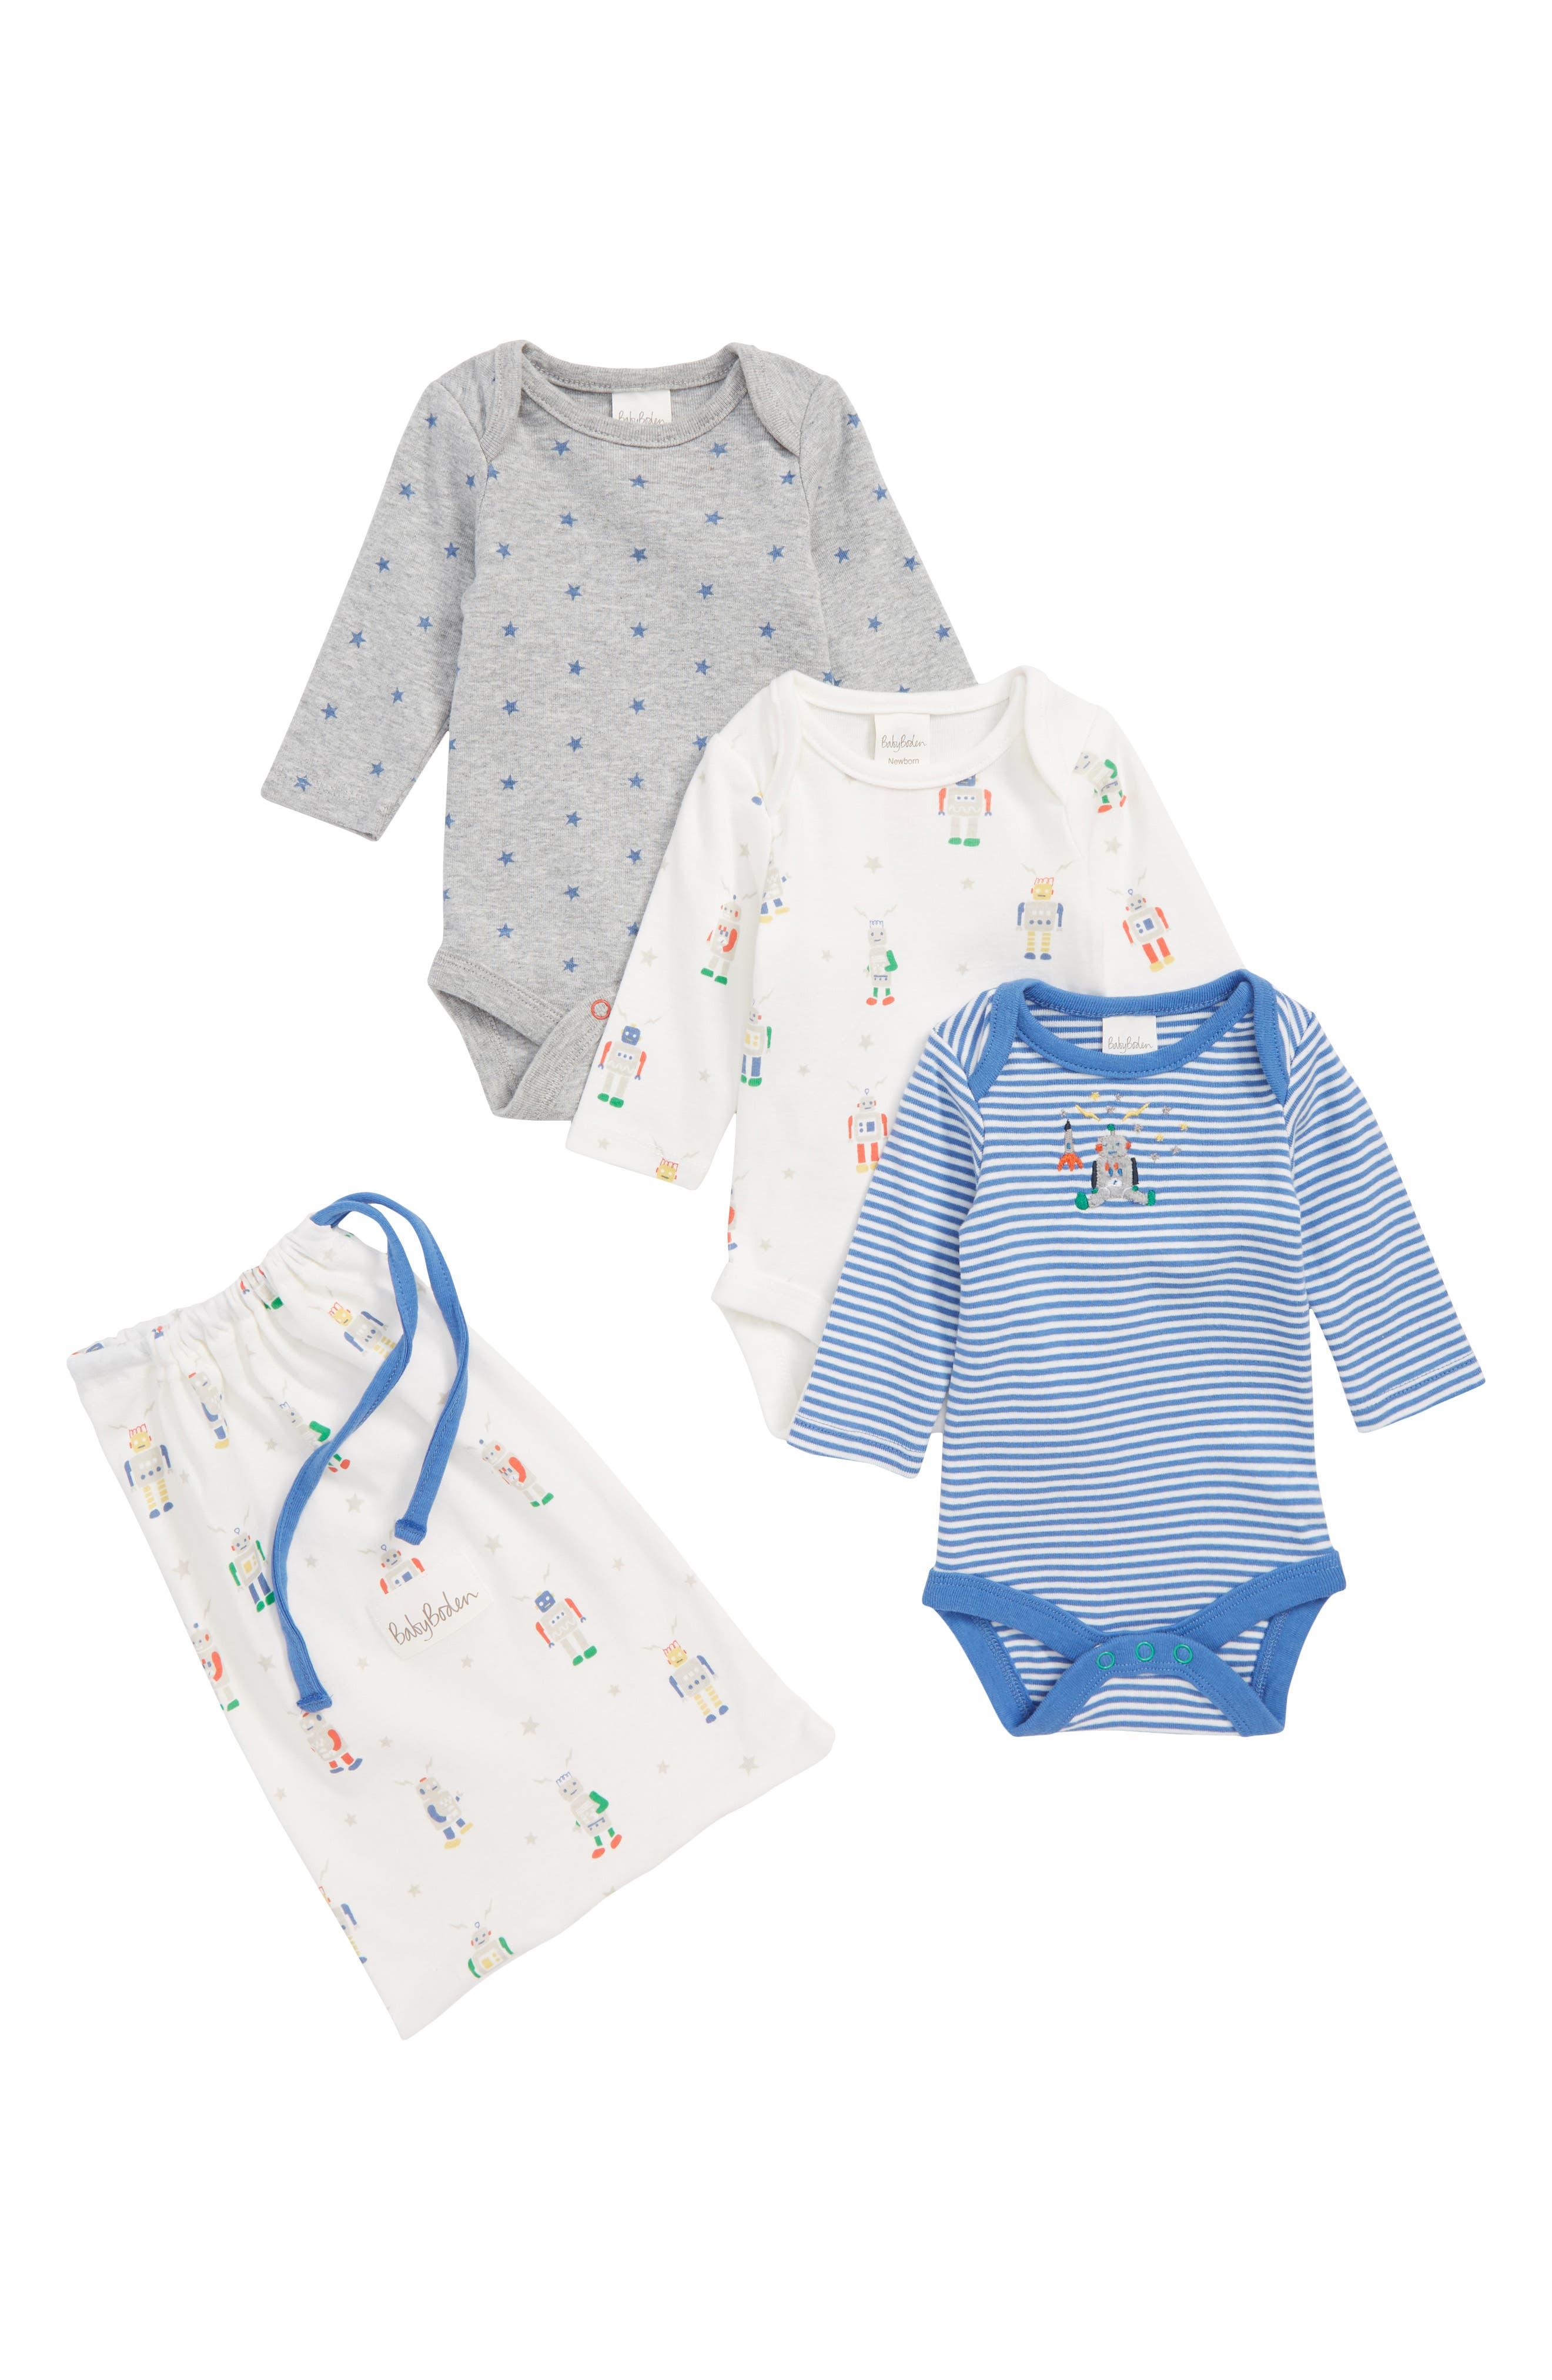 698a0e4cd5ce Mini Boden Baby Boy Blue Clothing  T-Shirts